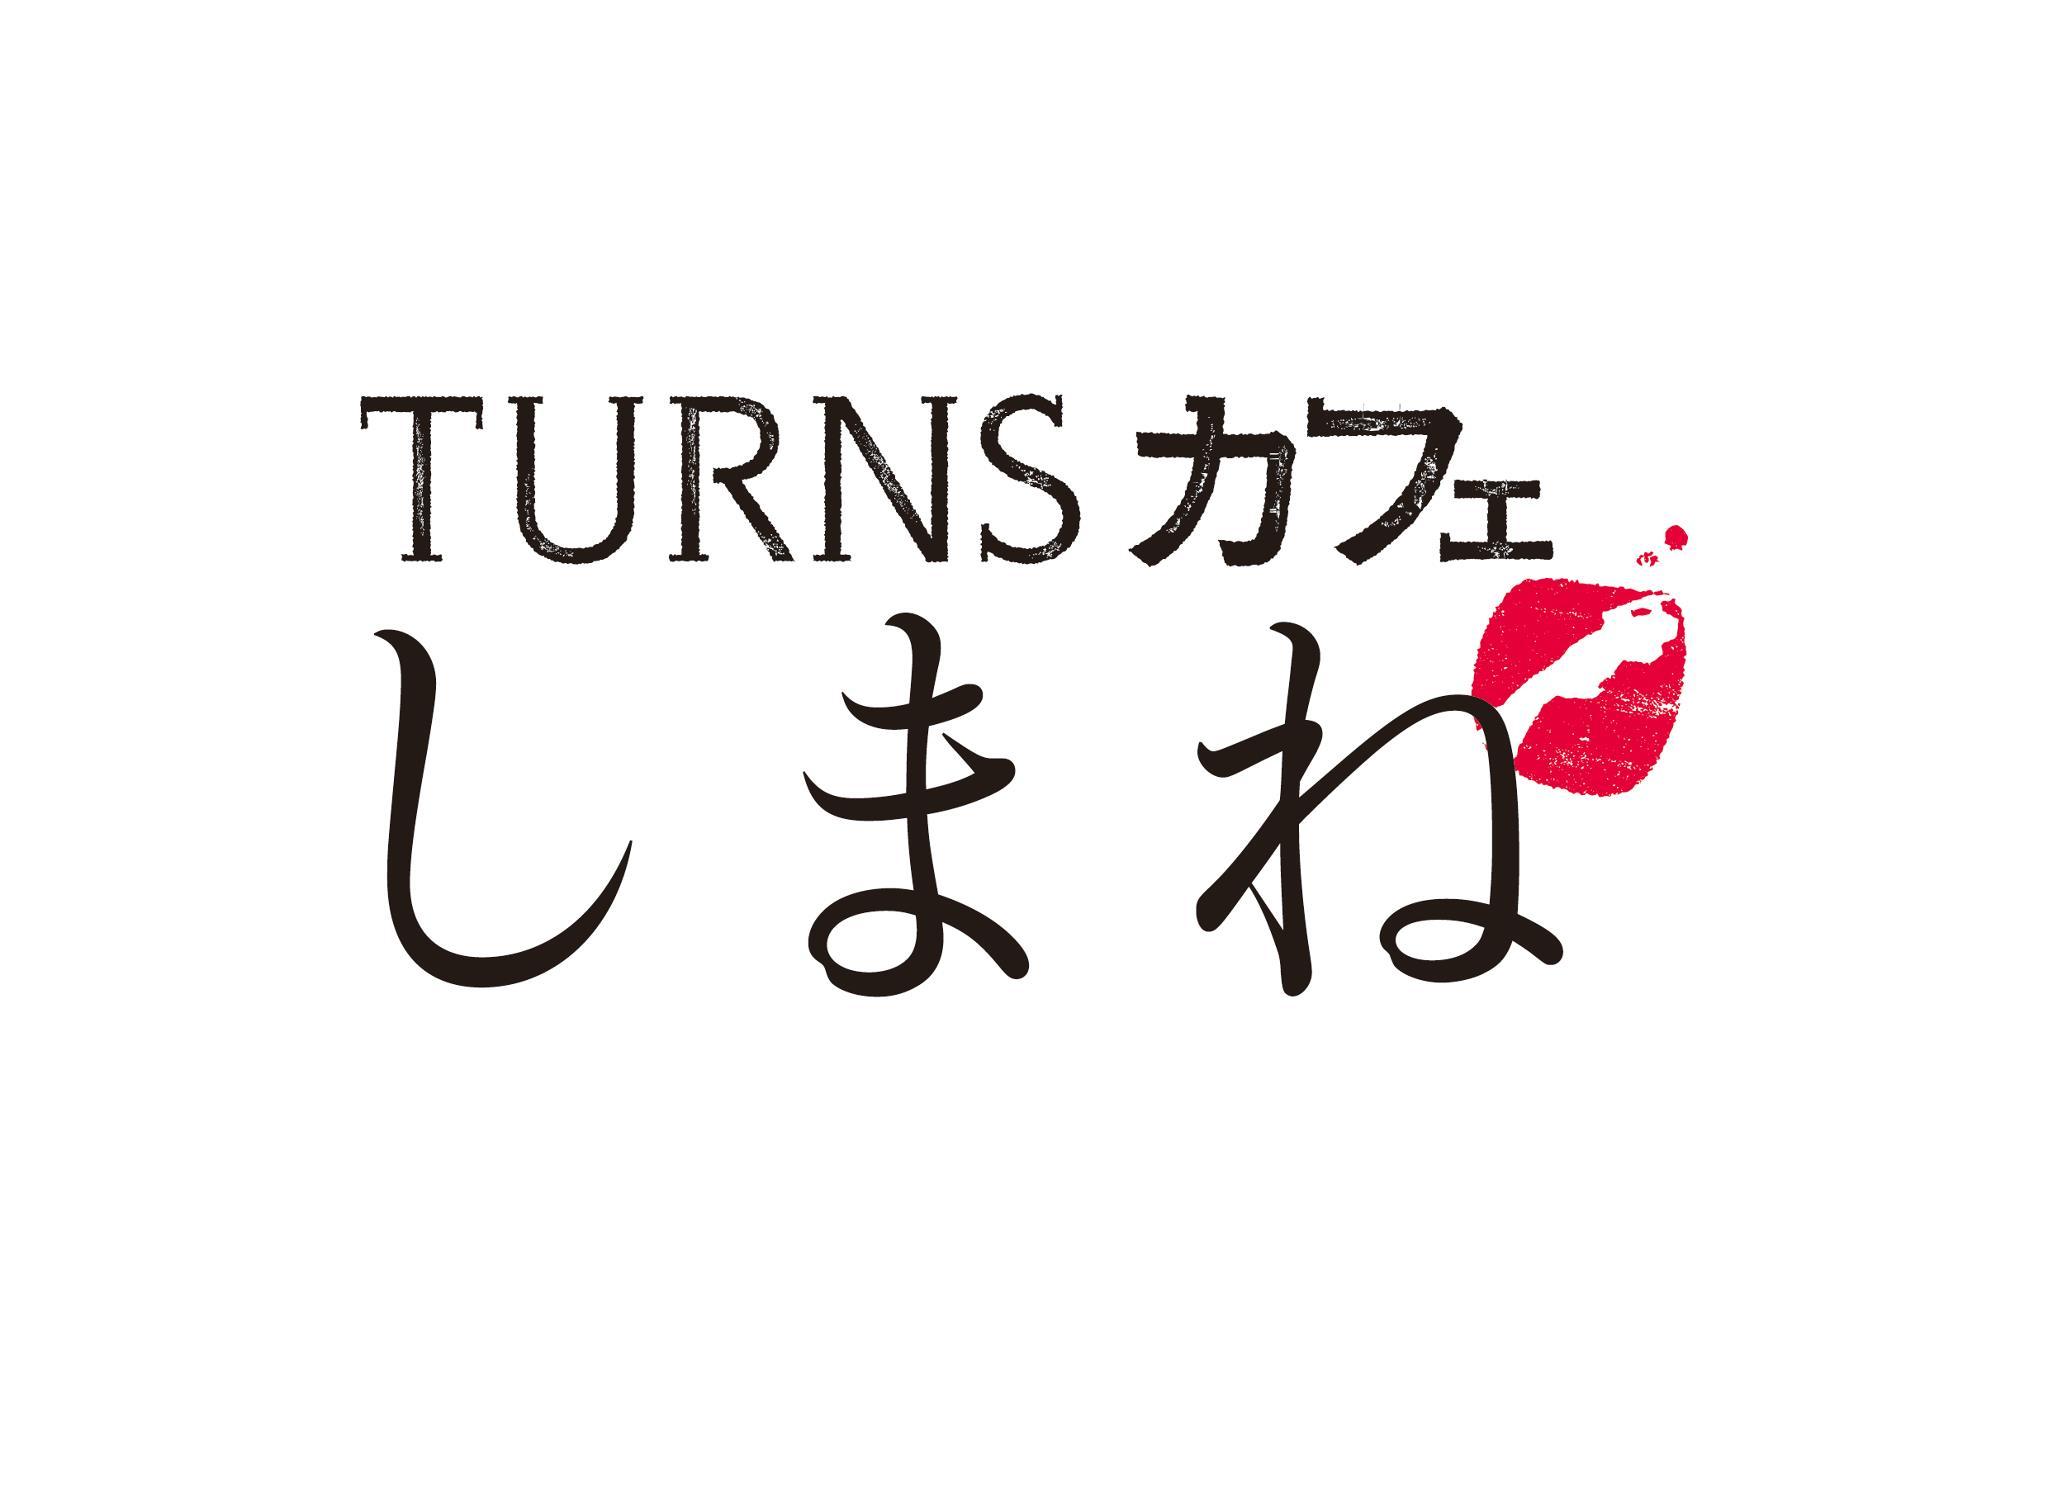 turns1